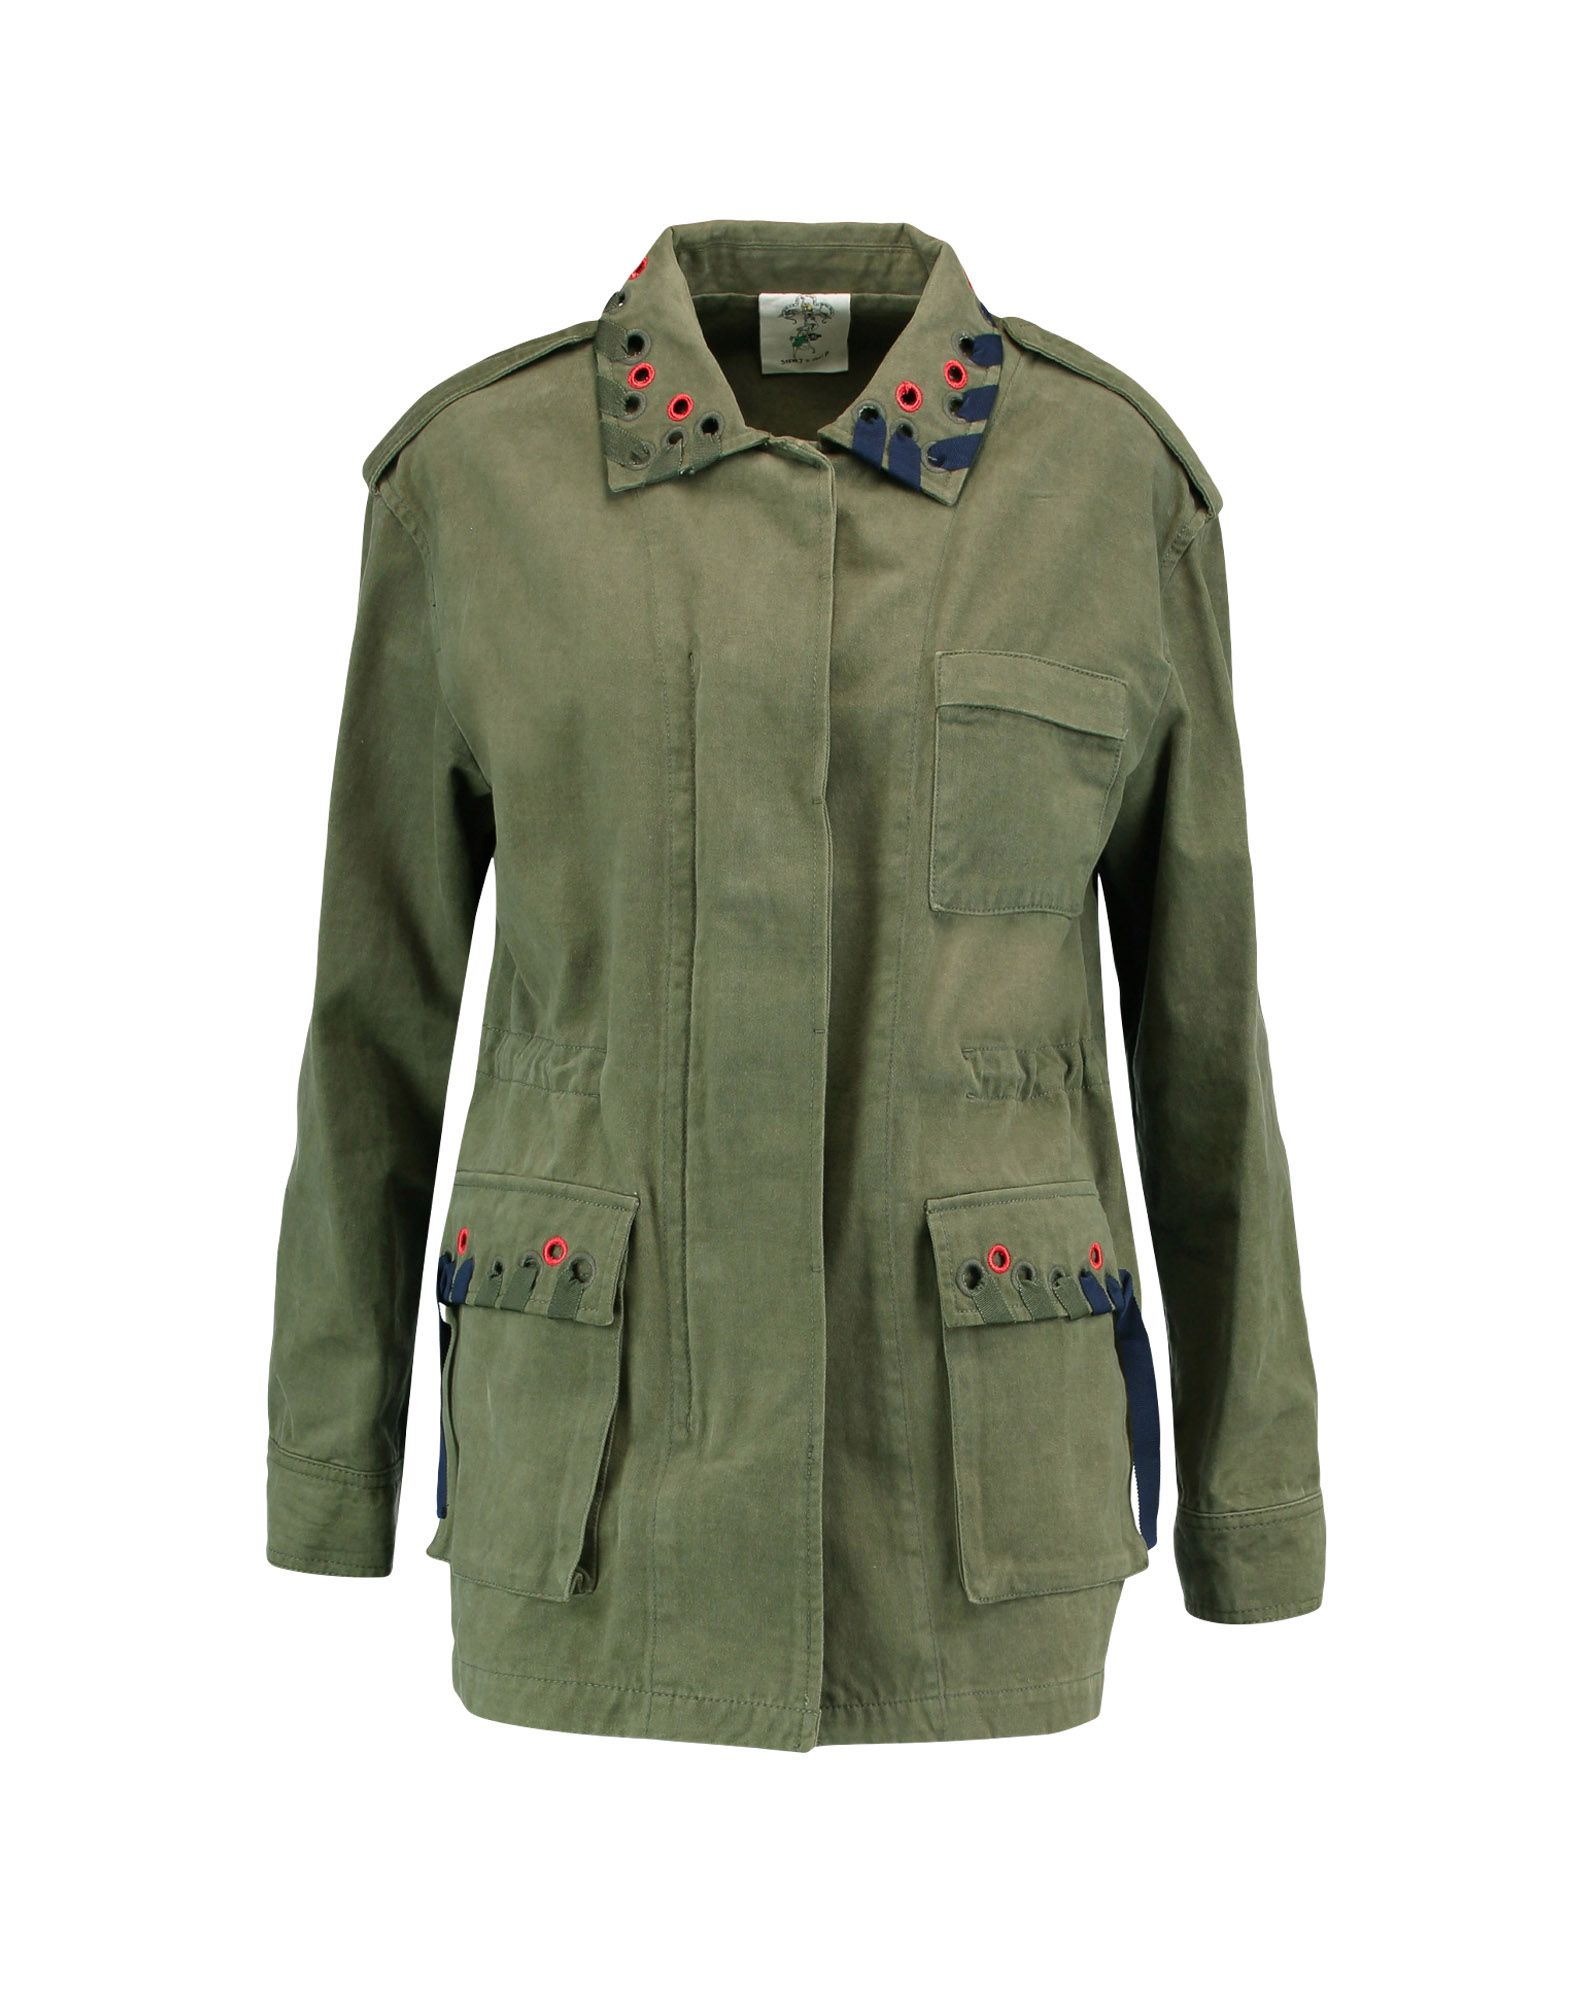 STEVE J & YONI P Full-Length Jacket in Military Green